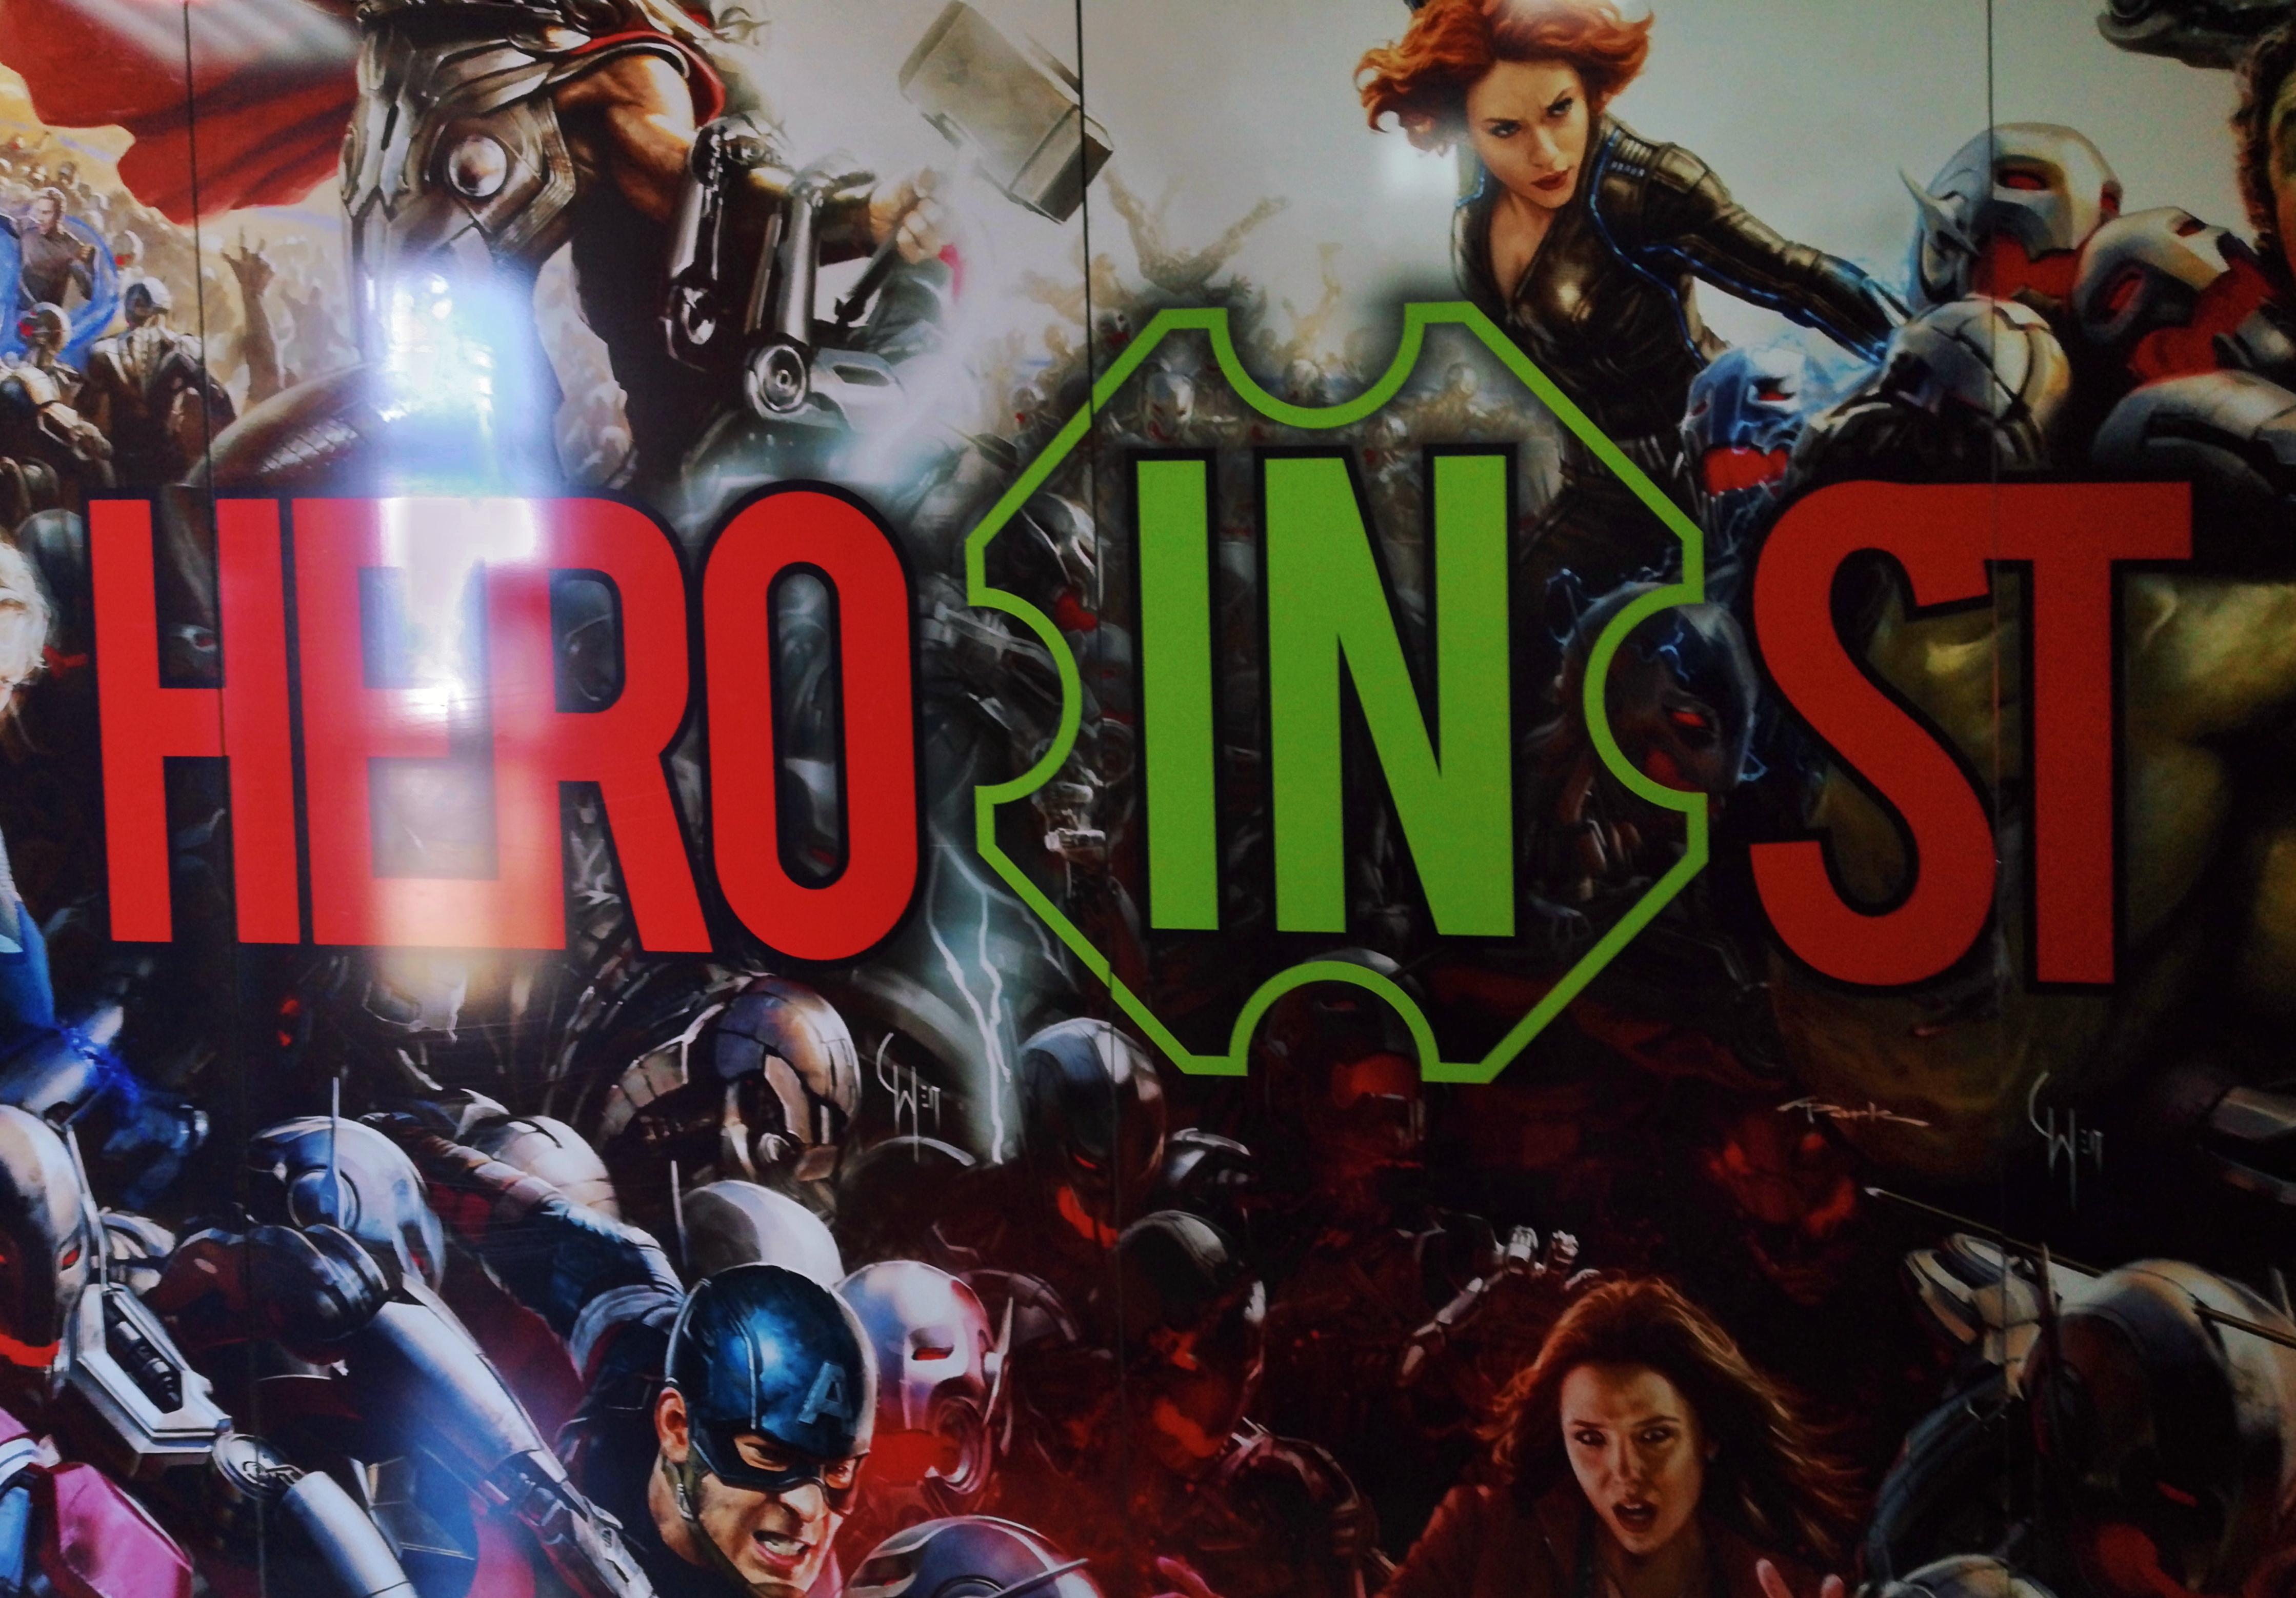 Огромный плакат у входа в HERO in ST